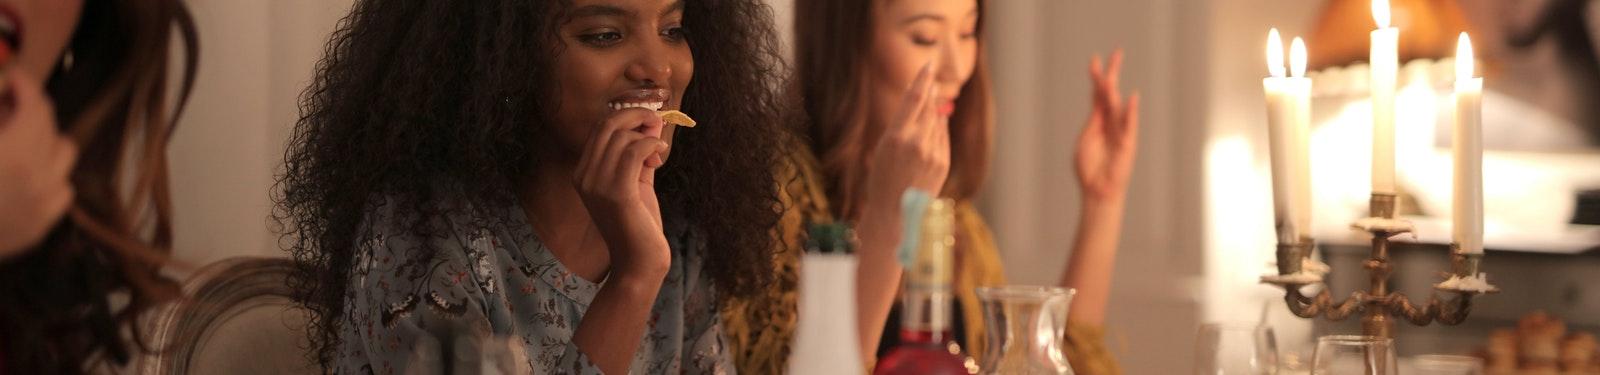 comer con pausa reduce la obesidad